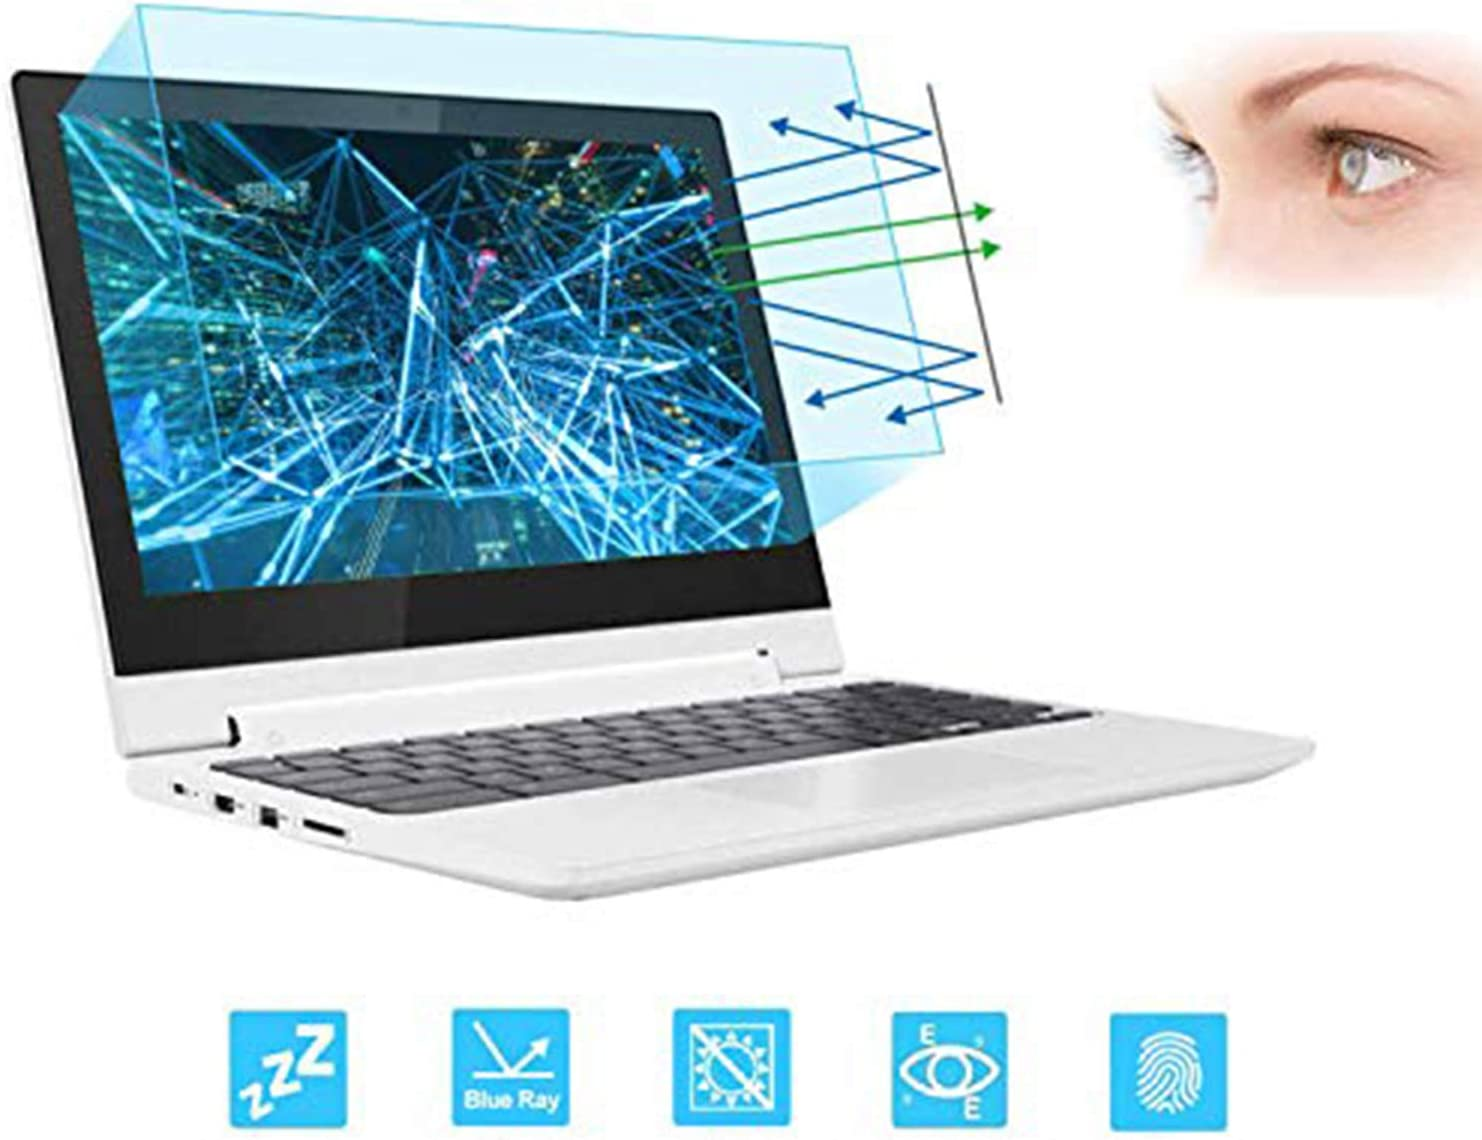 "11.6"" Laptop Screen Protector -Blue Light Filter, Eye Protection Blue Light Blocking Anti Glare Screen Protector for All 11.6"" 16:9 Laptop (!!!Not Include The Screen Bezel)"